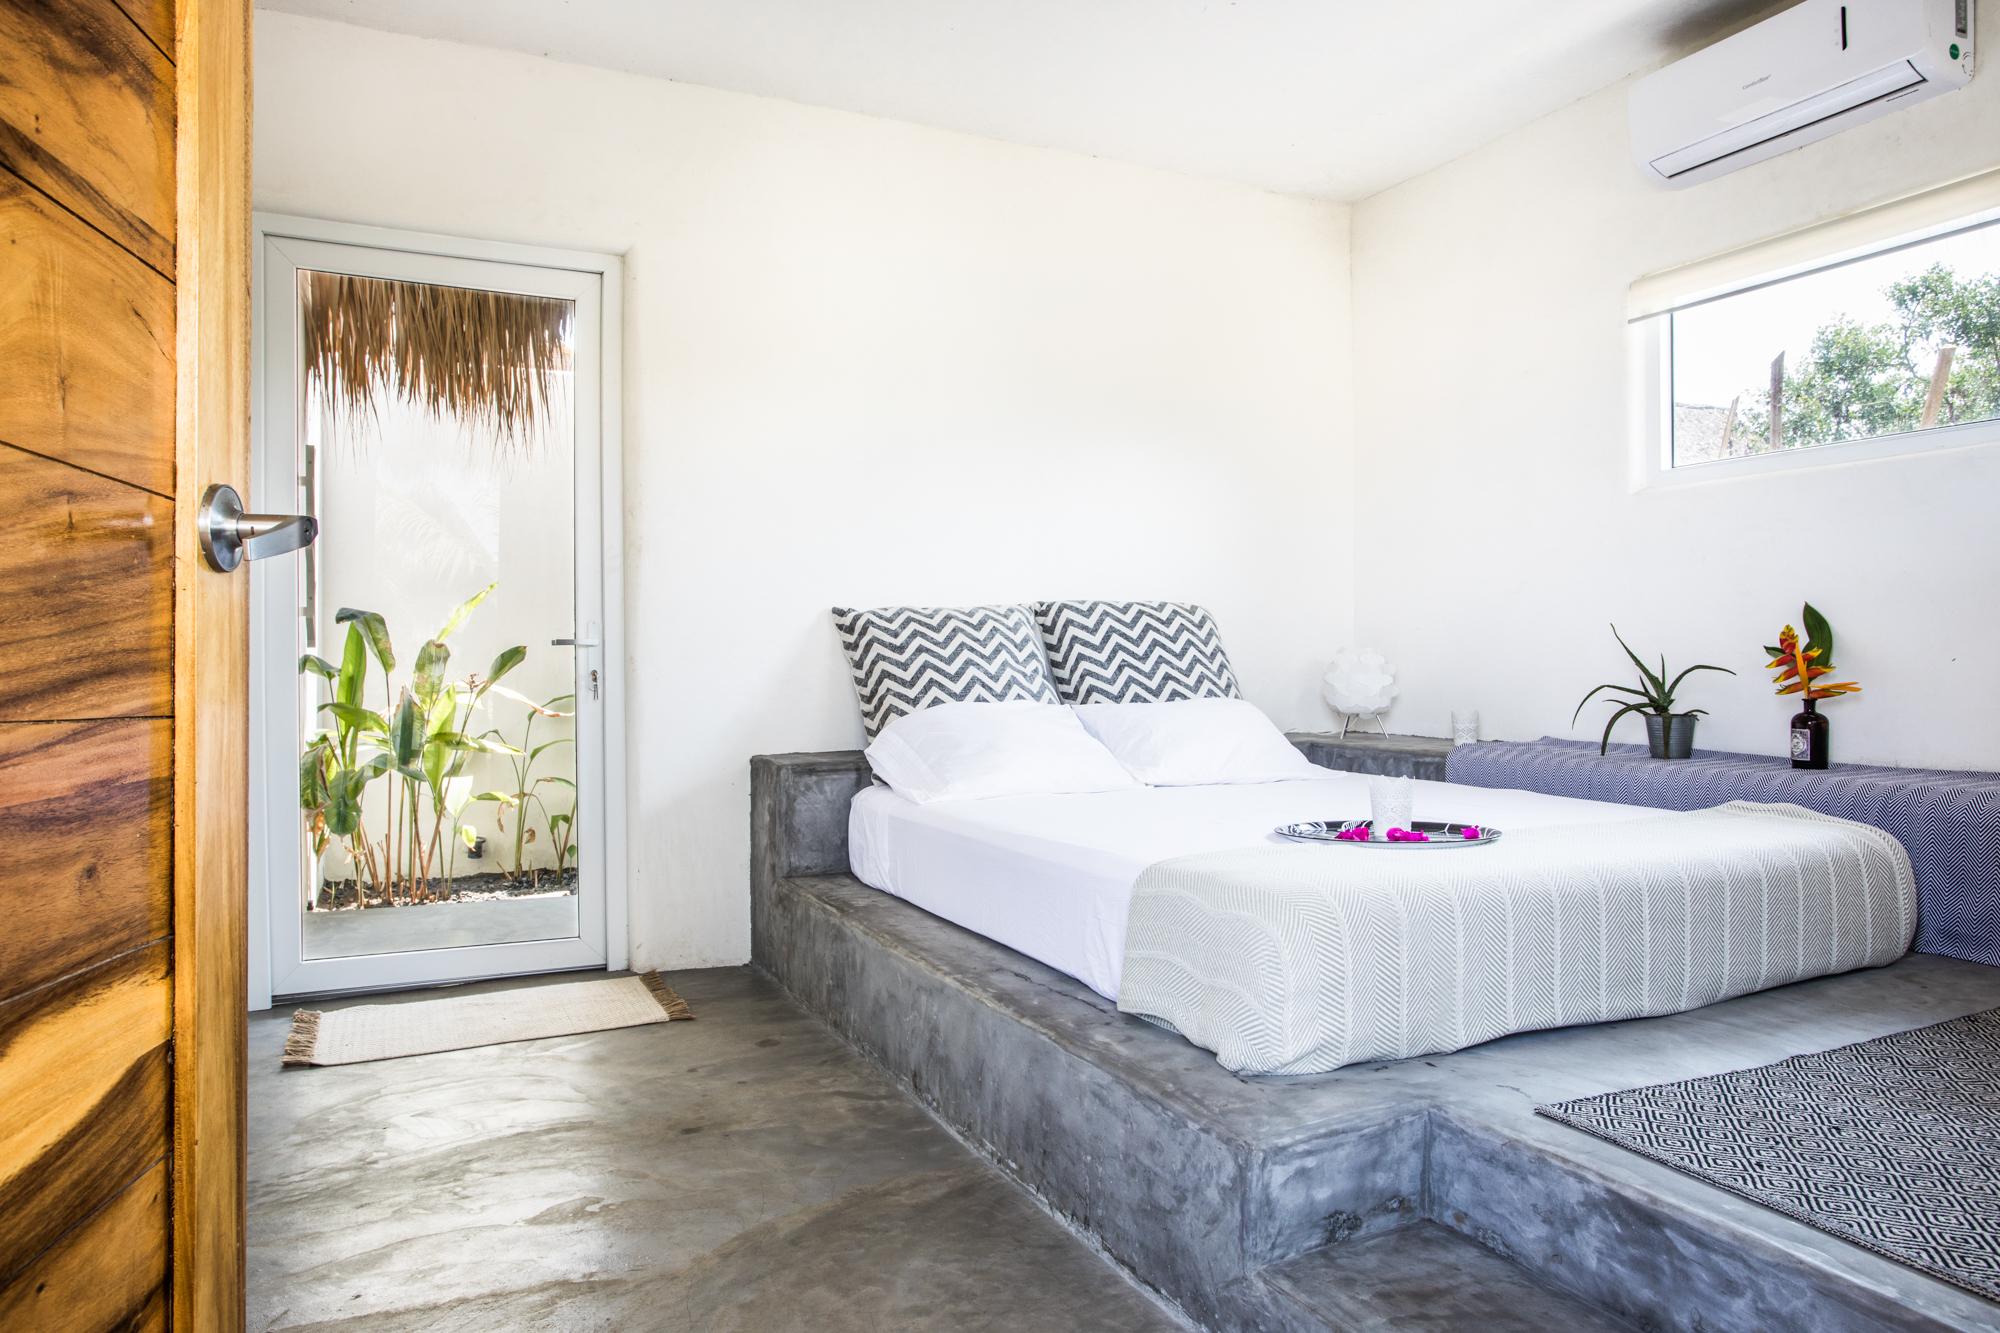 Swell Hotel Bedroom Suite